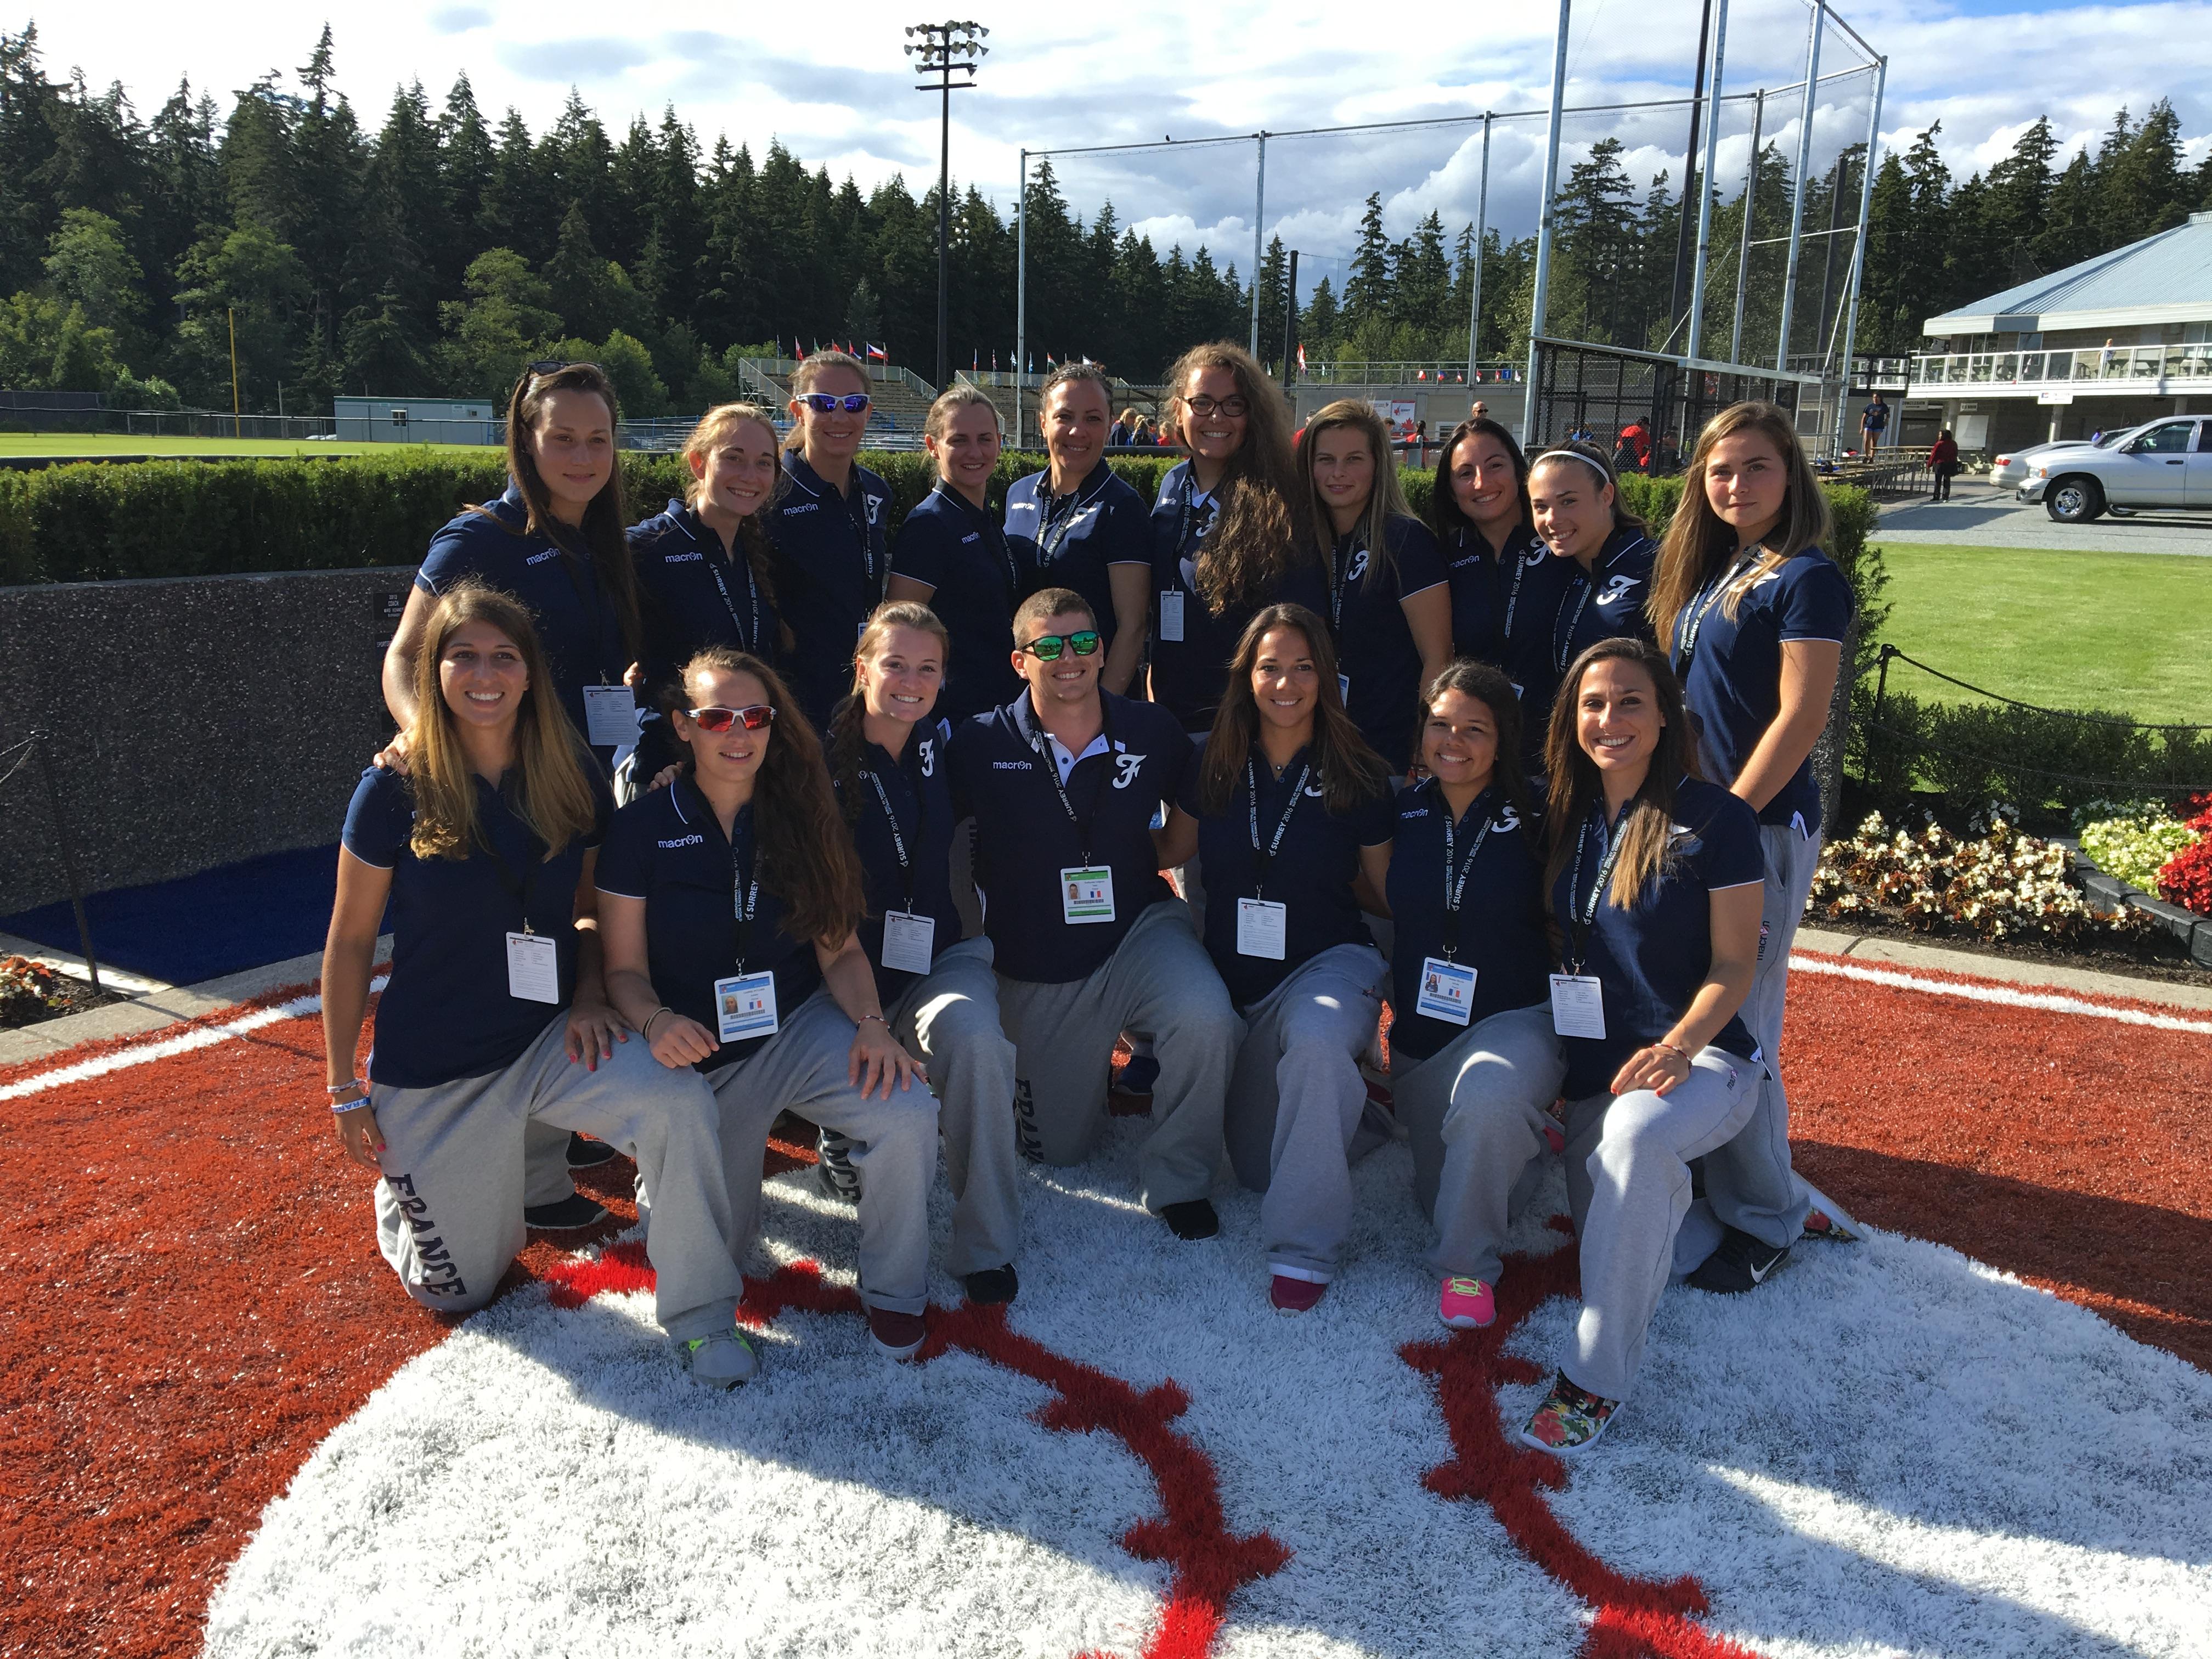 championnat du monde canada 2016 (3)